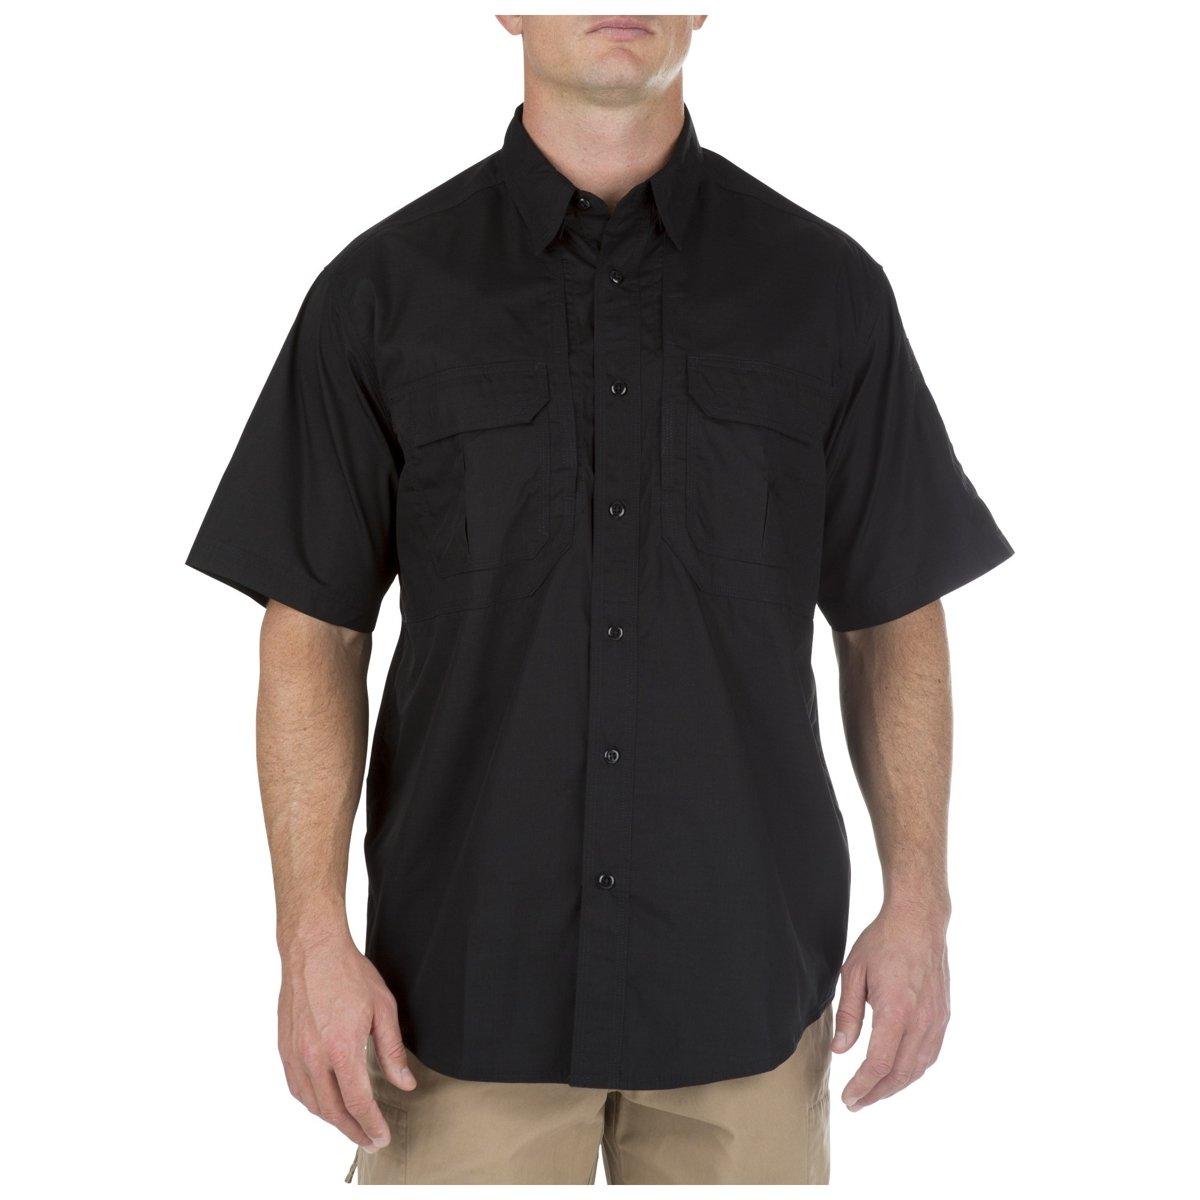 Koszula taclite pro short sleeve shirt kr tki r kaw for 5 11 tactical taclite pro short sleeve shirt